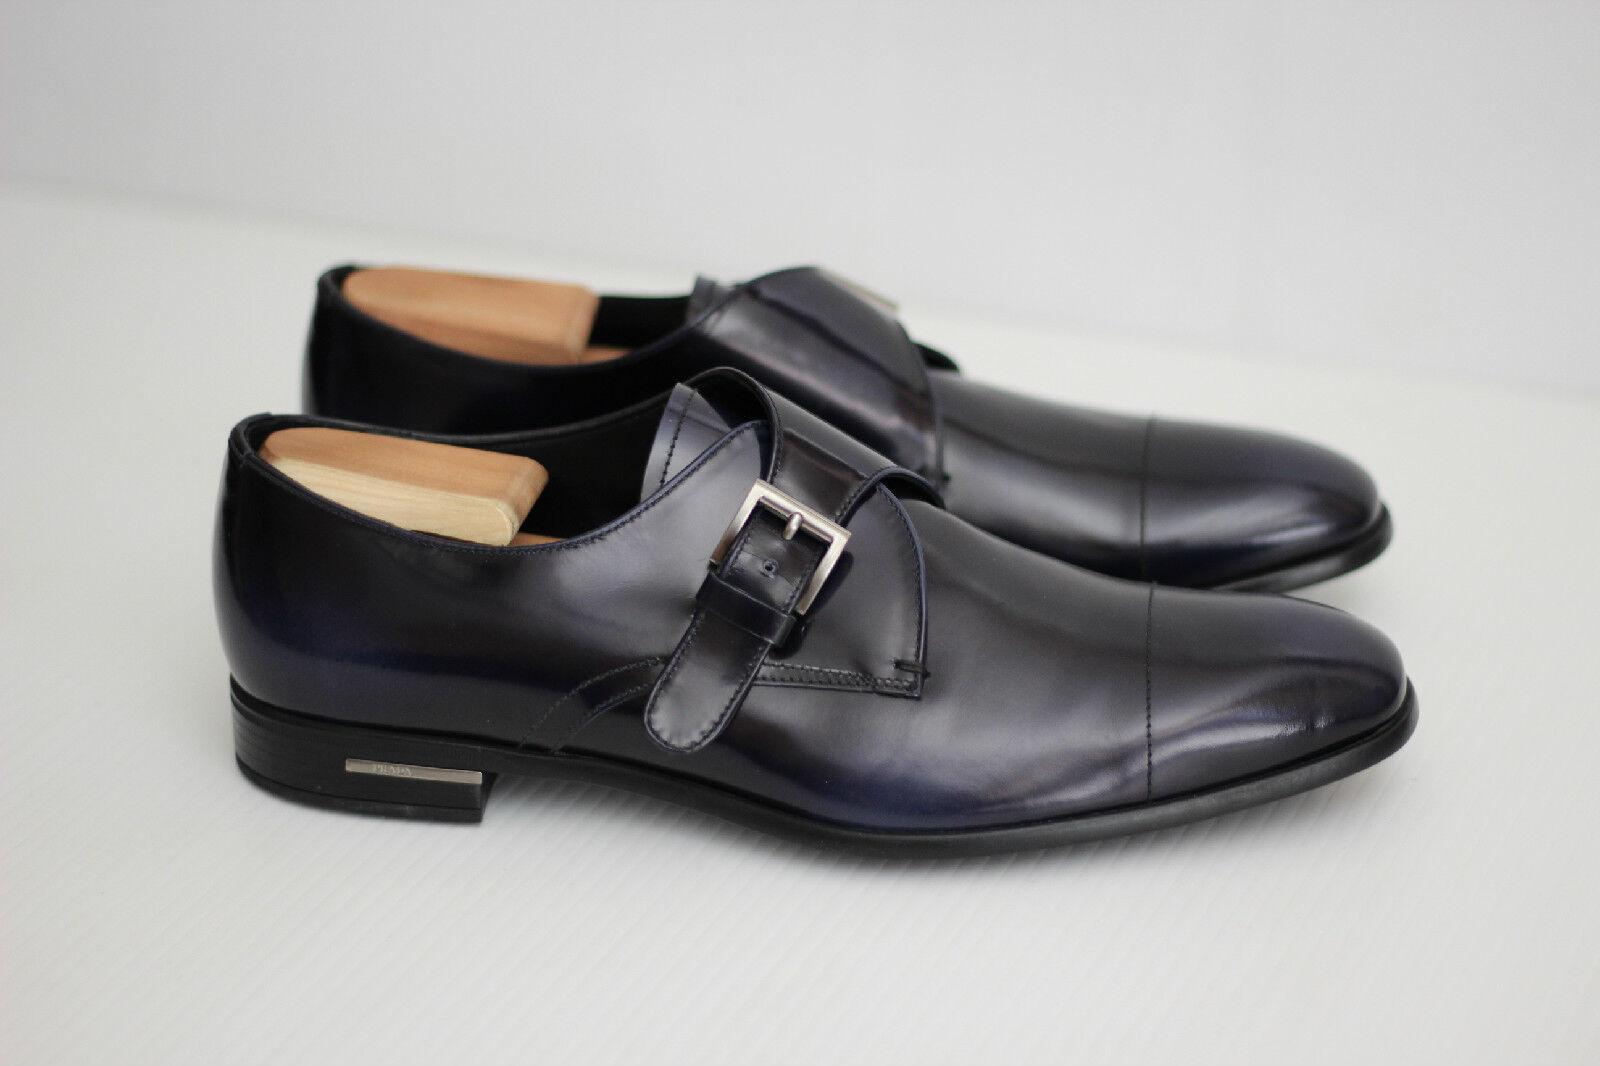 NEW Prada Monk Strap Shoes - Blue Leather - 9.5US / 8.5C016  (U8)